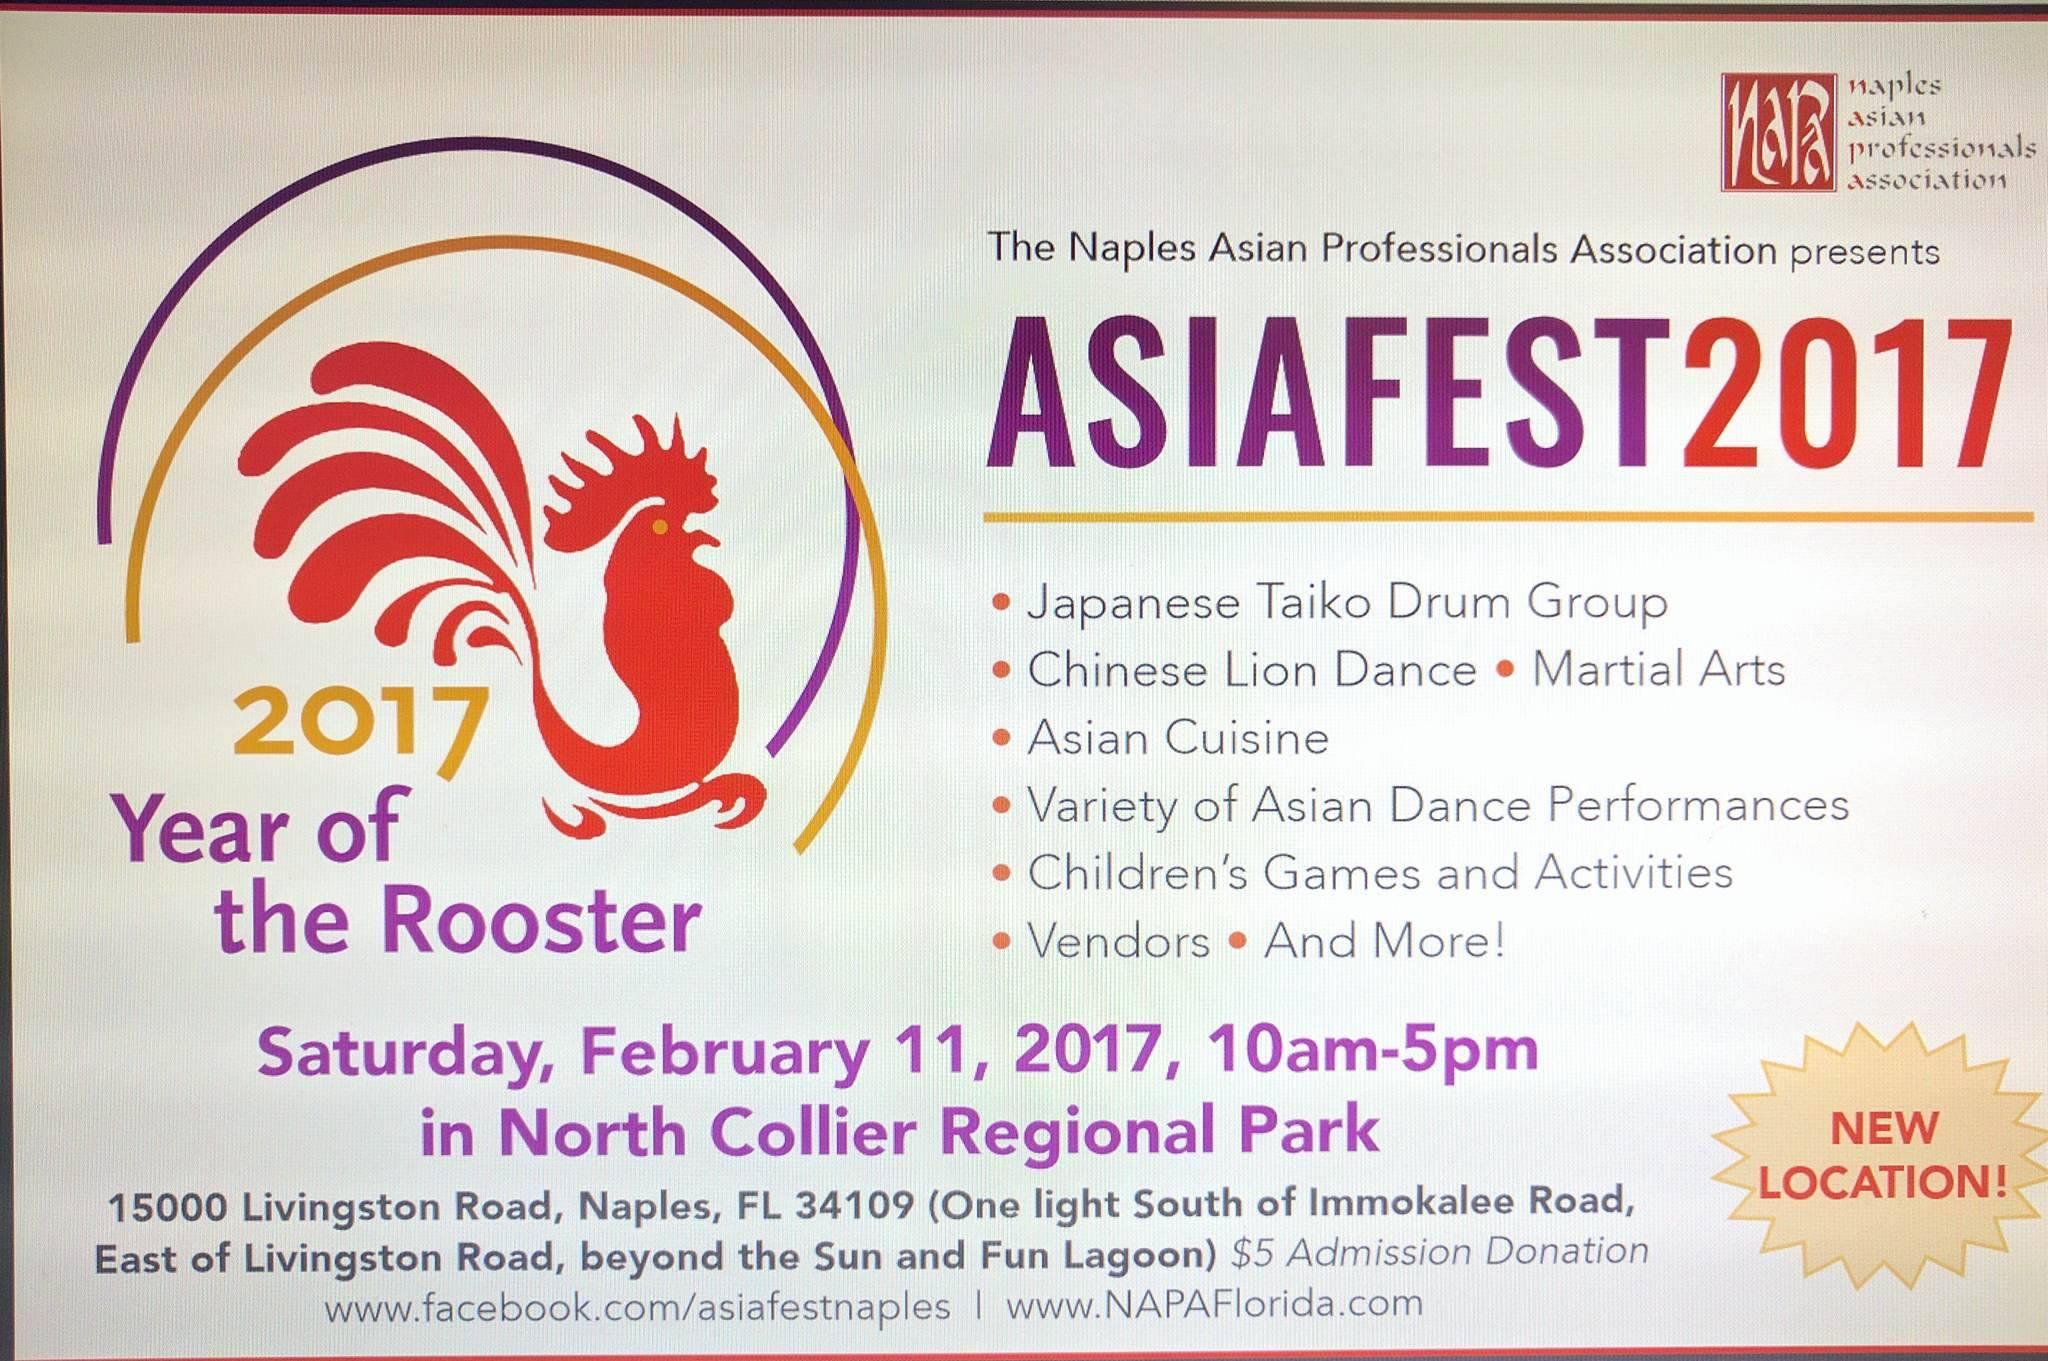 Asia Fest 2017 Naples, FL